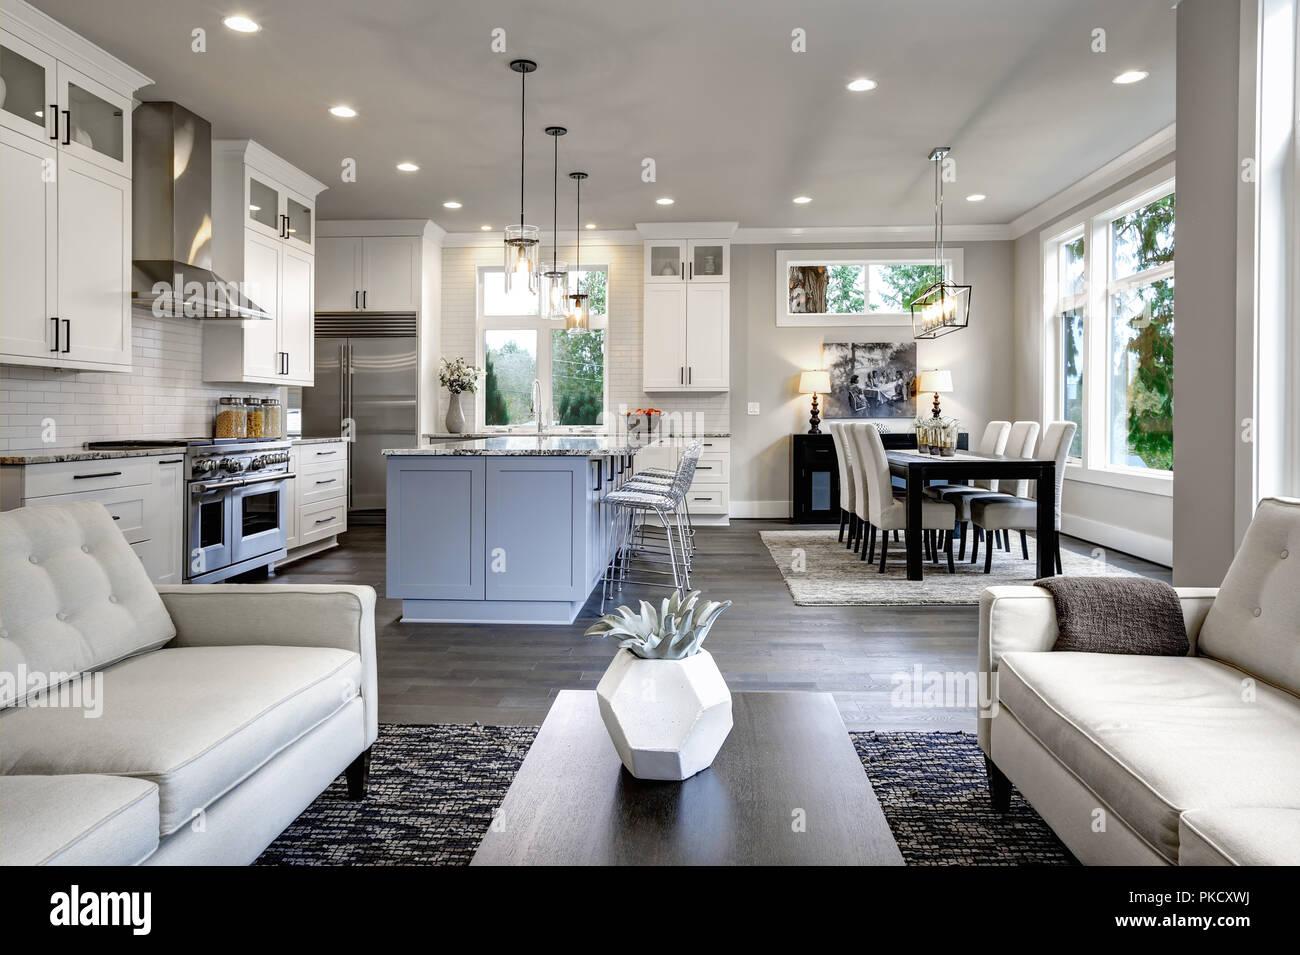 Luxurious home interior in Bellevue, WA - Stock Image